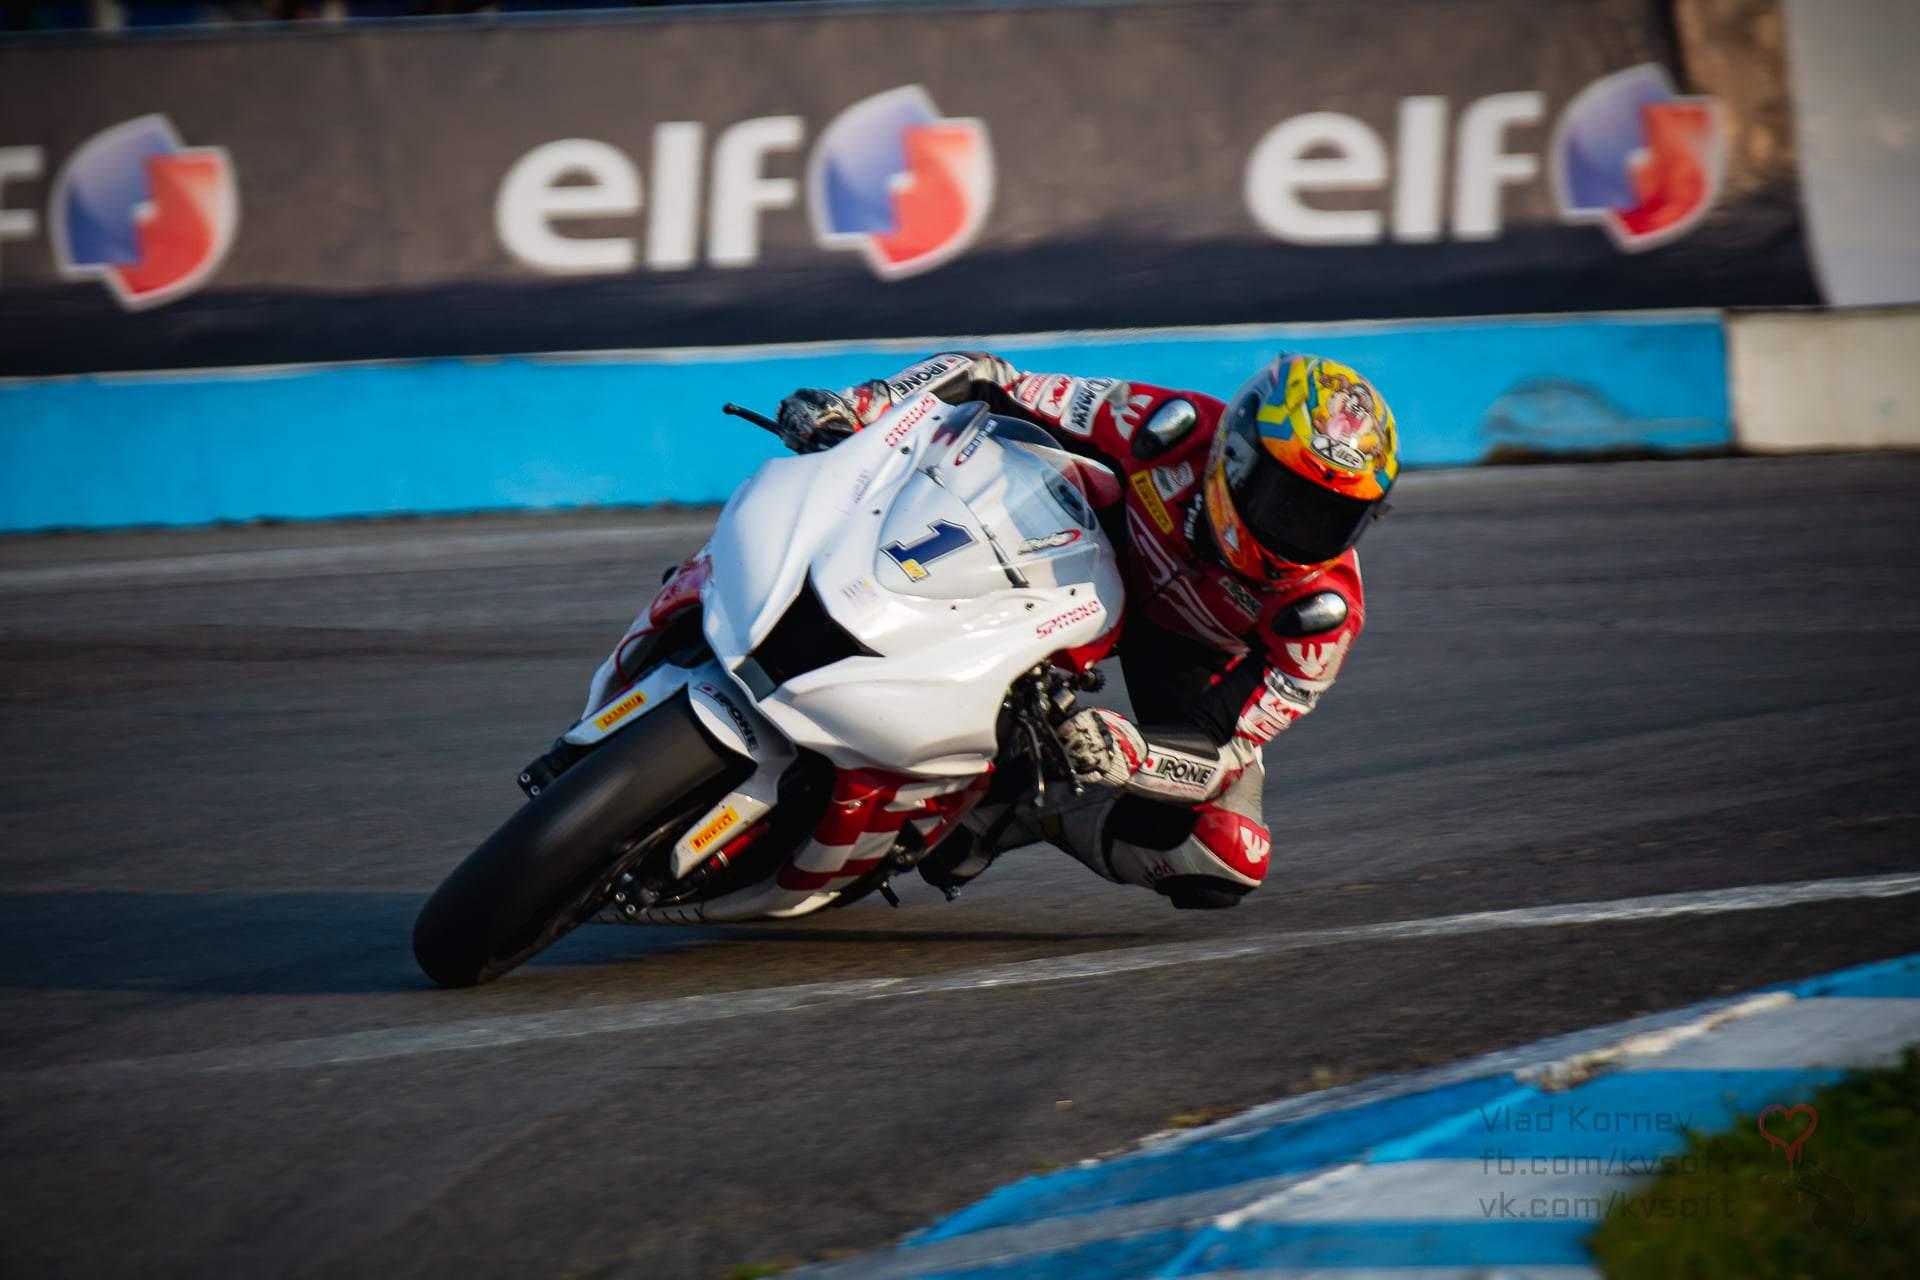 5-6_etap_MotoGPUkraine_014